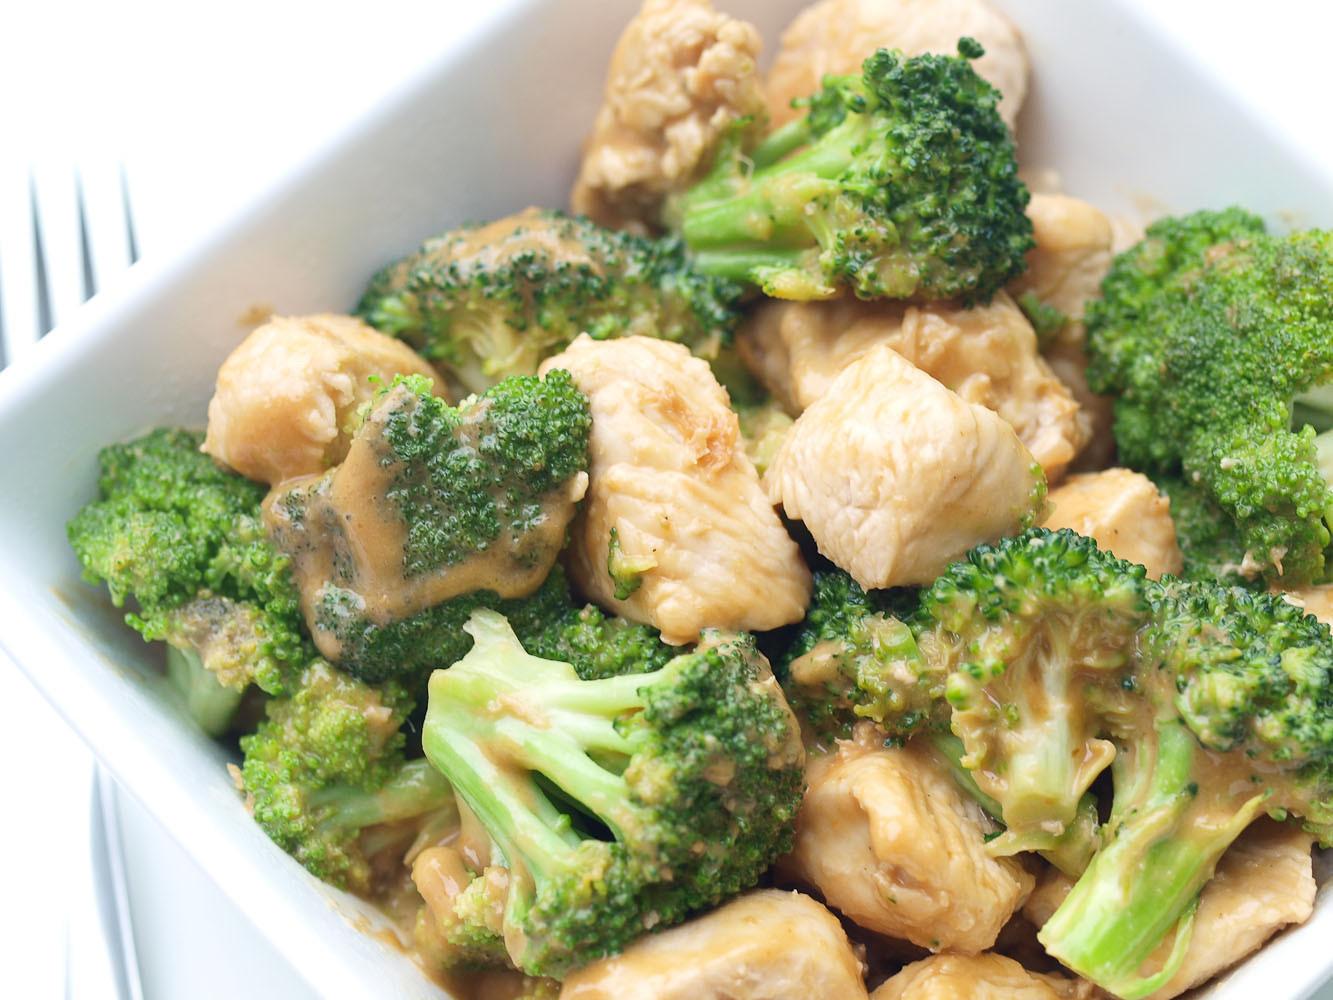 Healthy Broccoli Recipes  Easy Broccoli and Chicken with Peanut Sauce Happy